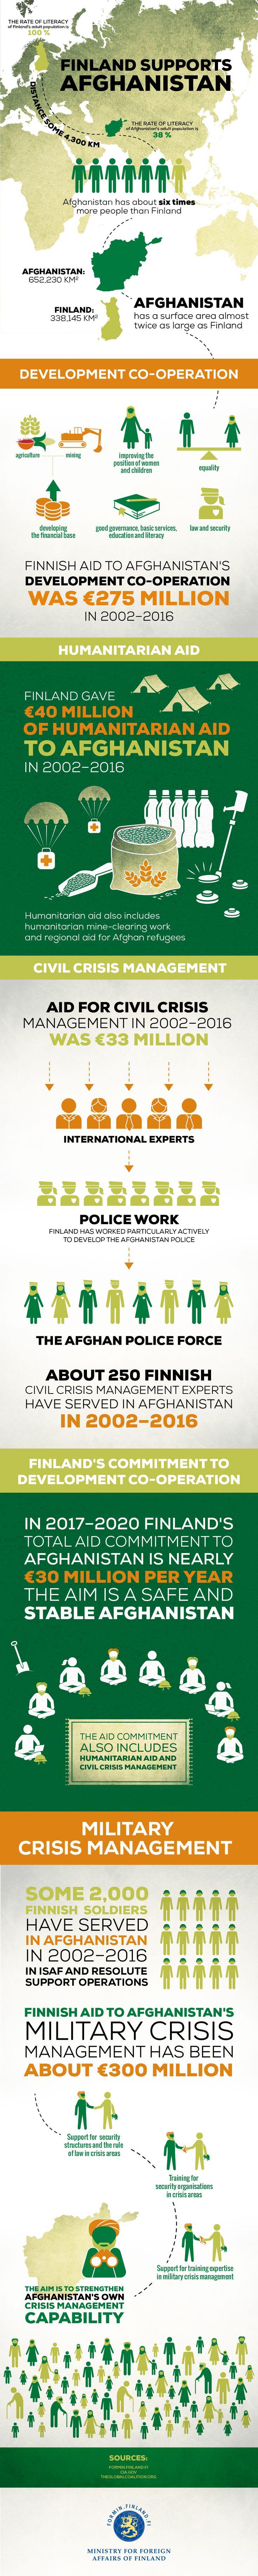 Infographic | infographic design | DigiPeople Studio | By Riikka Häkkinen